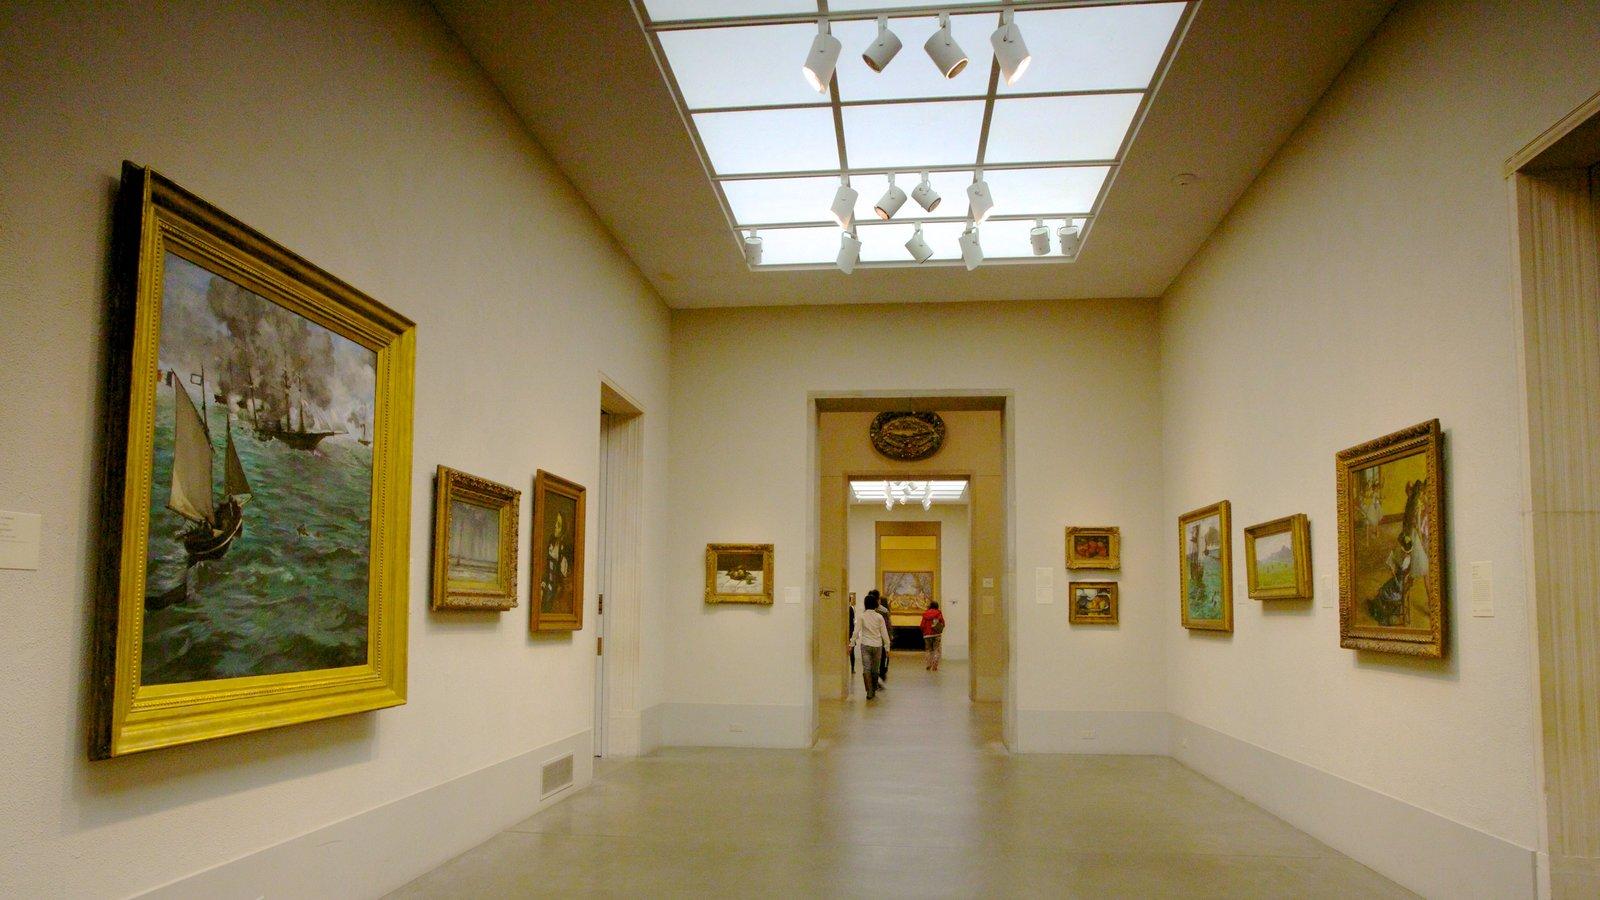 Museu de Arte caracterizando arte e vistas internas